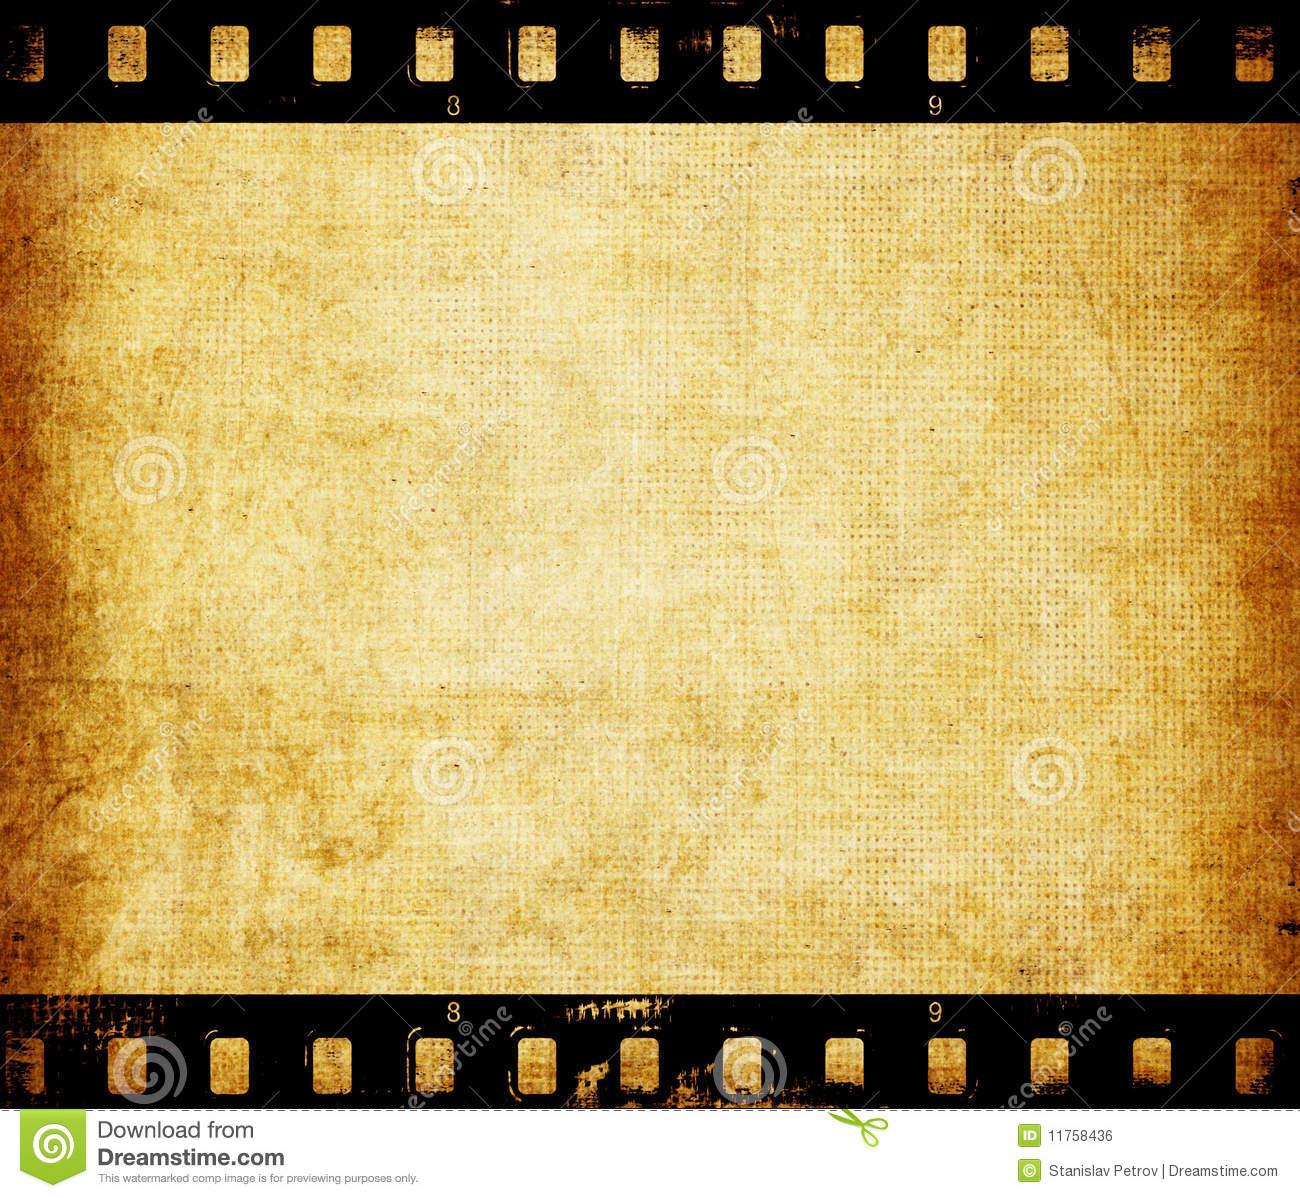 FunMozar Movie Film Wallpapers 1300x1198